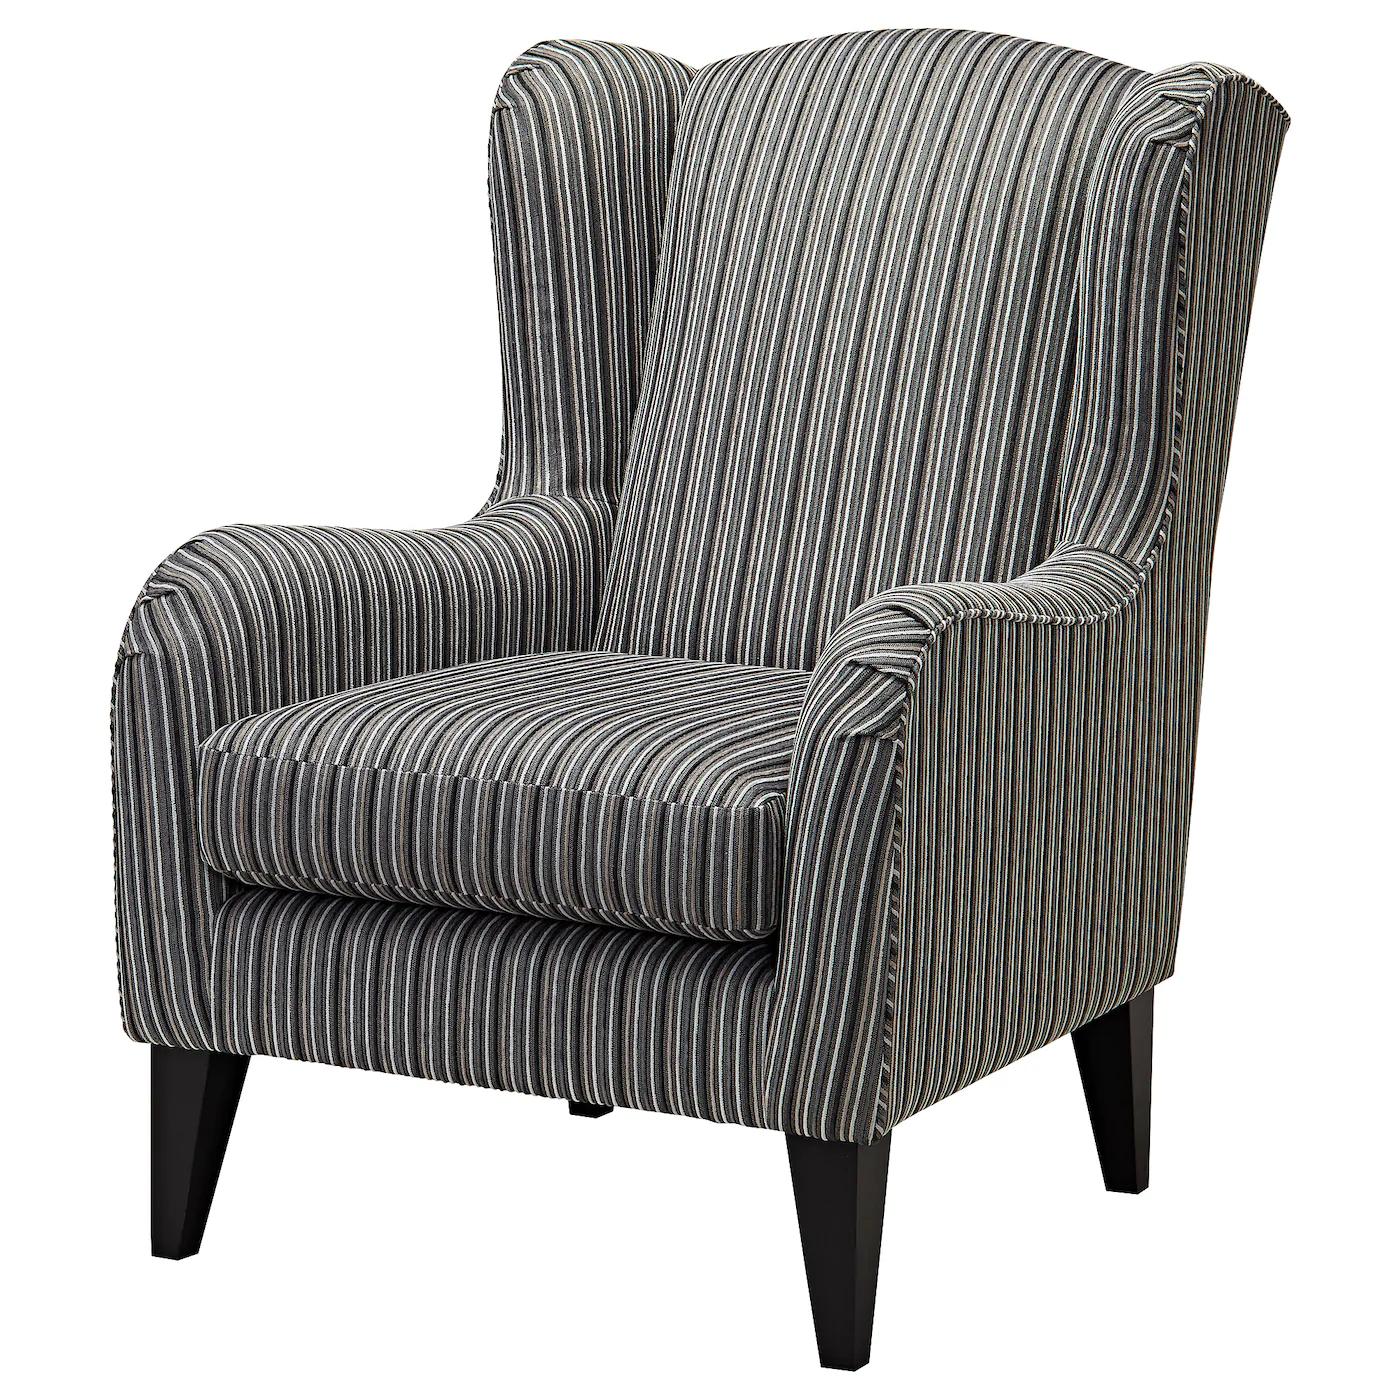 Wing Chair (Ramsebo) £179 / Footstall £35 (Free C&C) @ Ikea